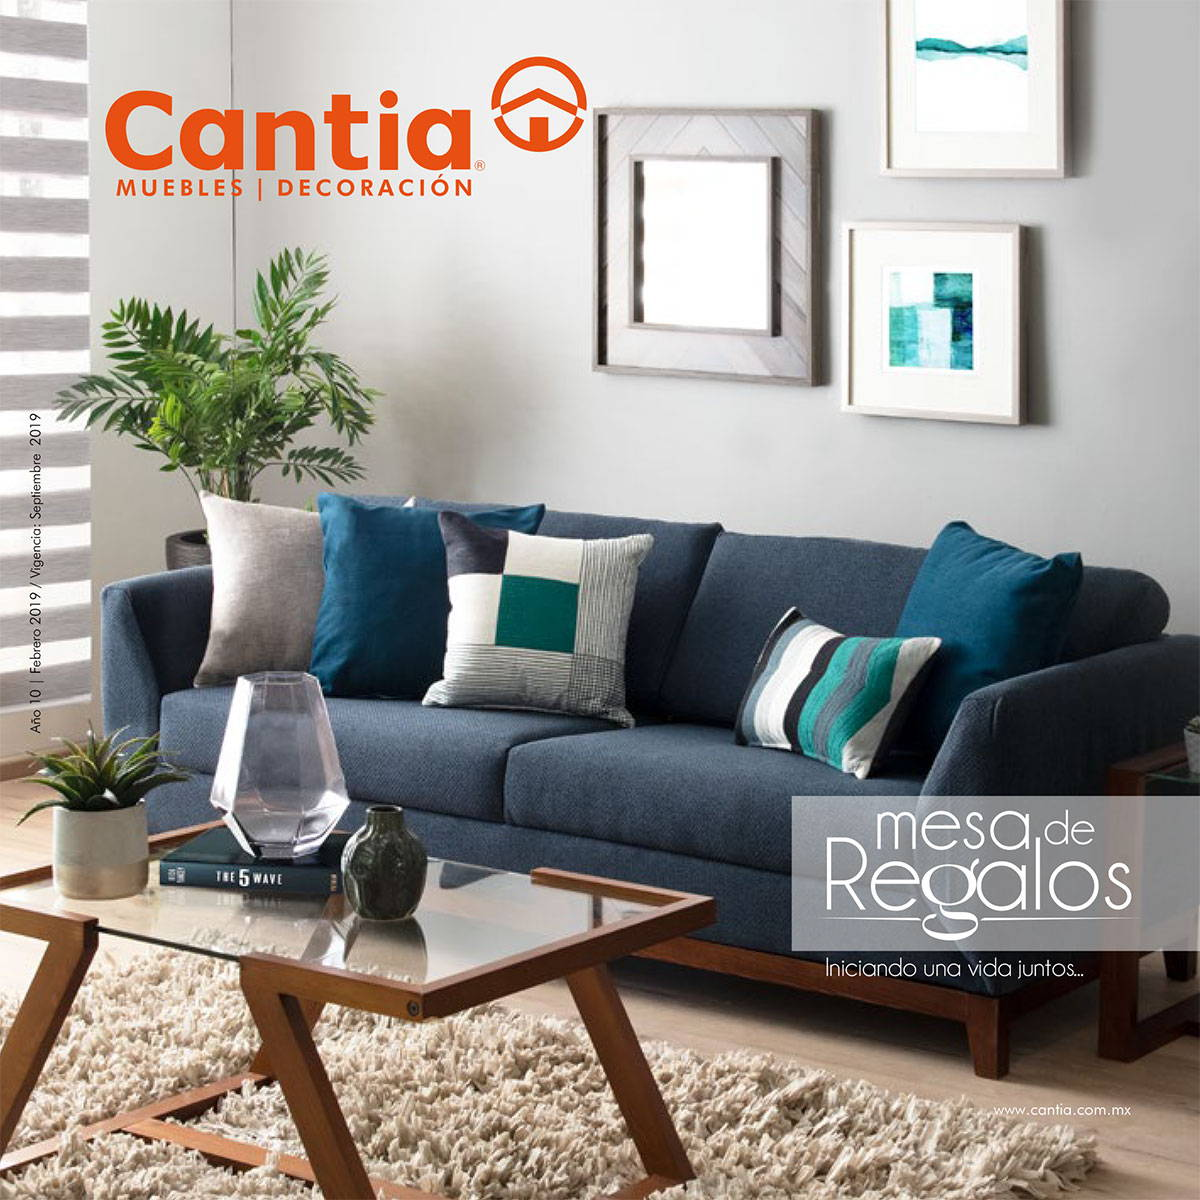 Catálogos Cantia